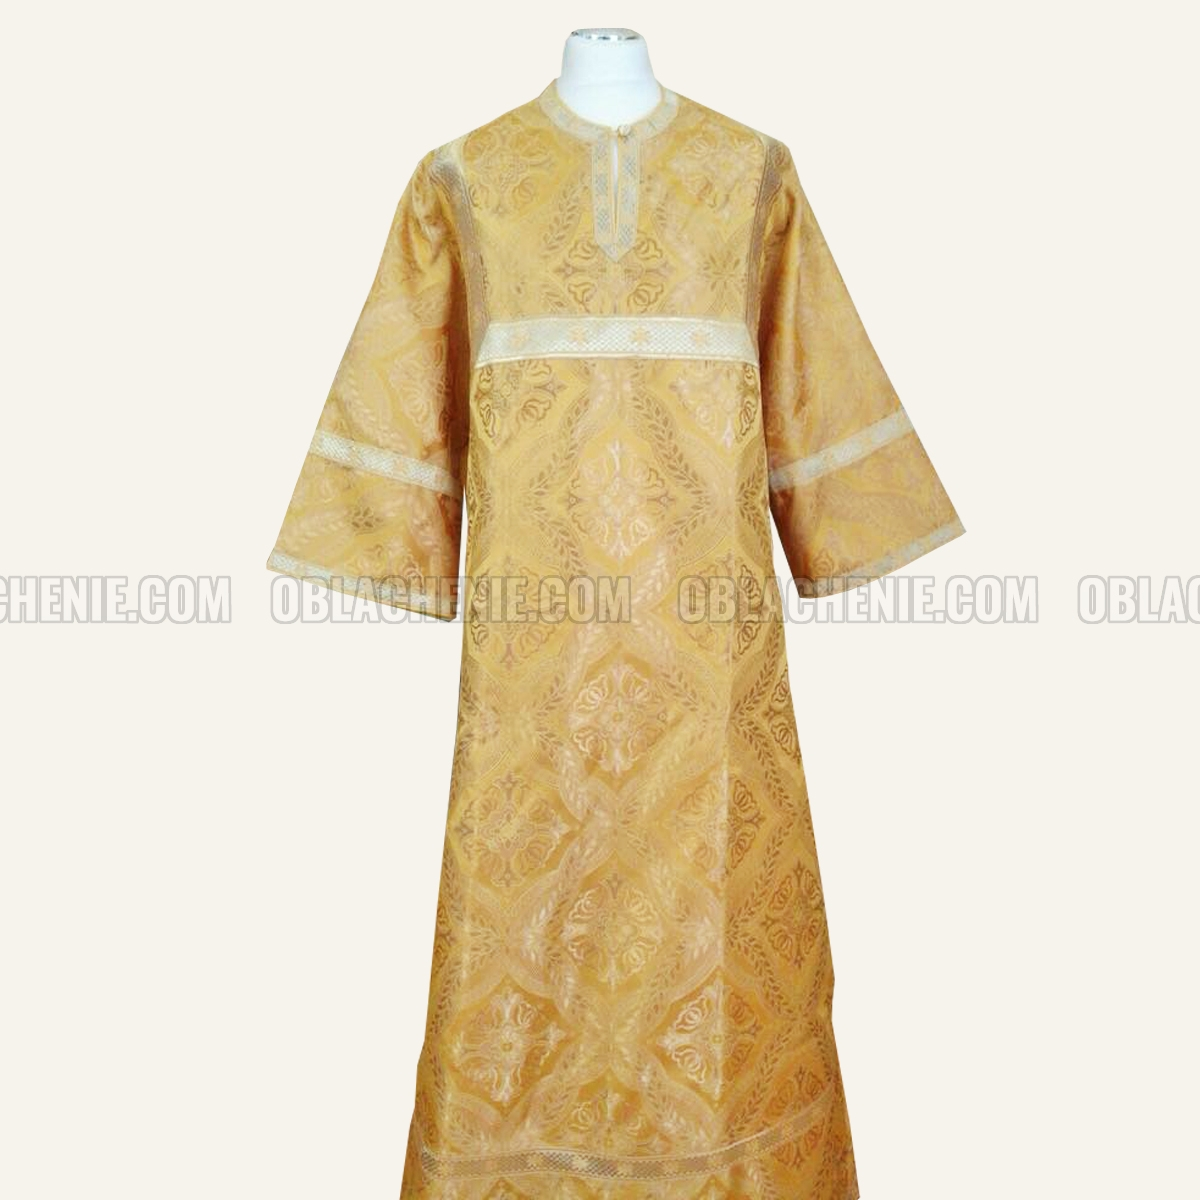 Altar server robes 10323